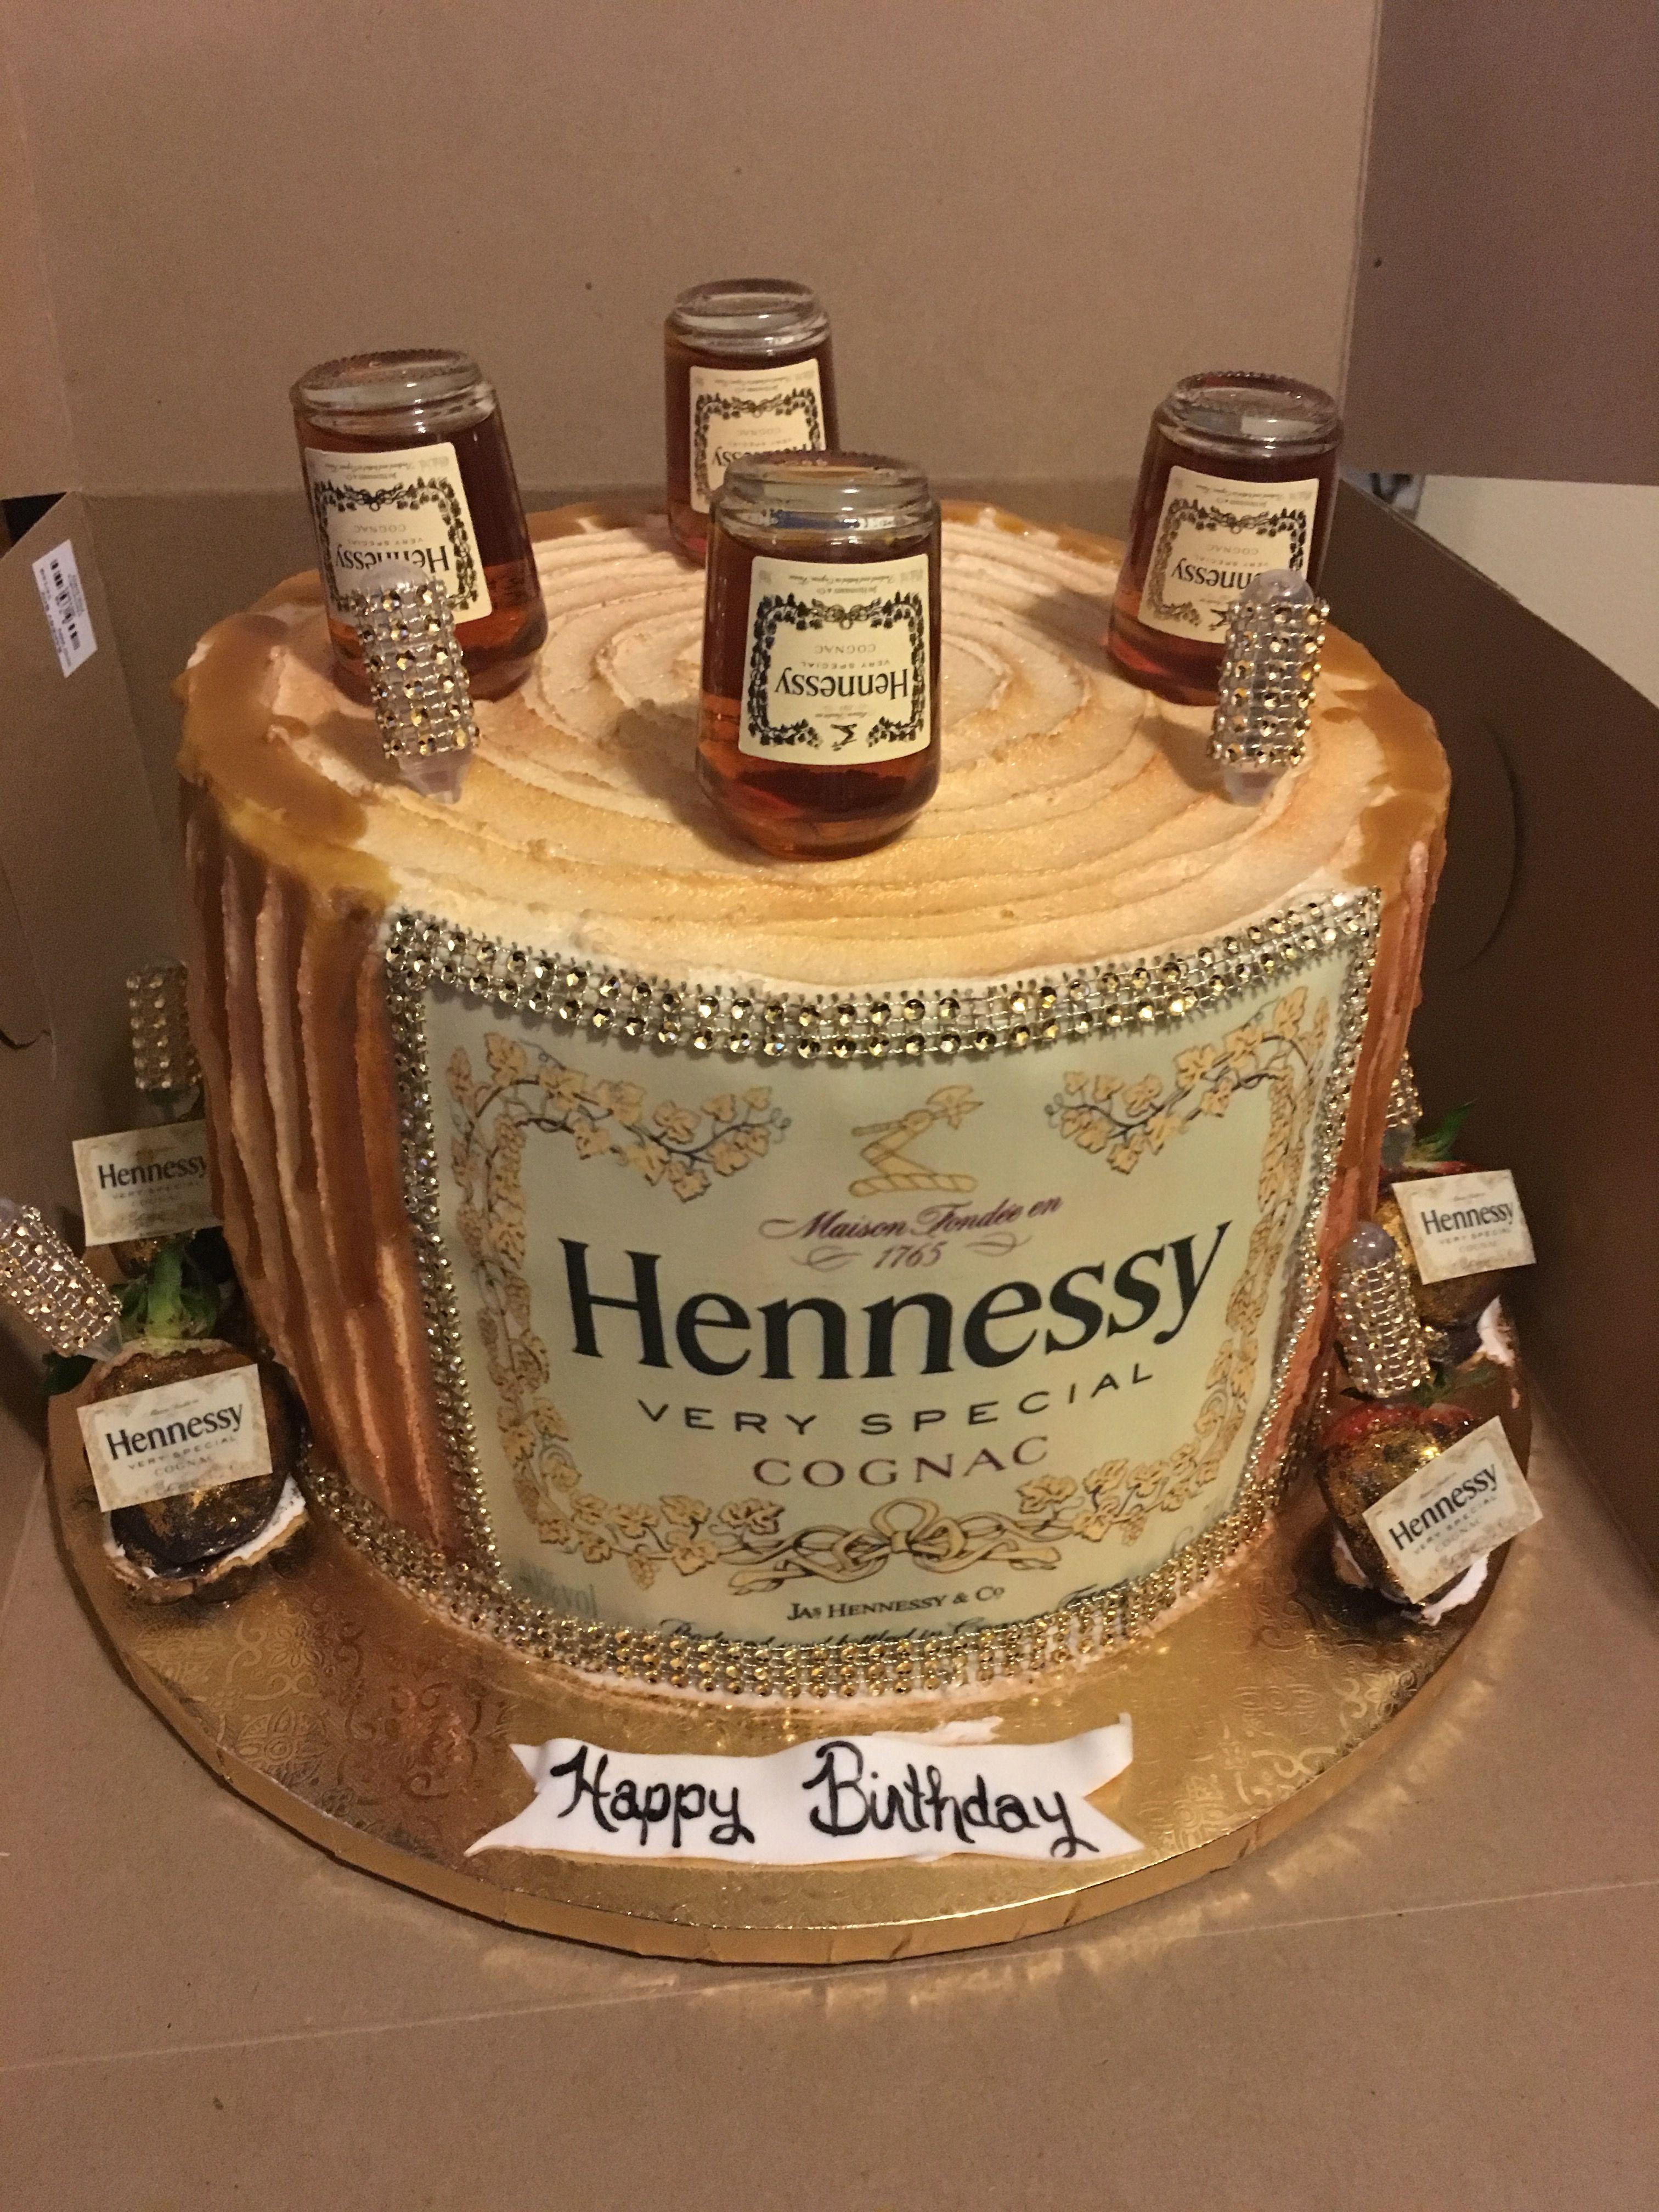 Incredible Hennessy Carmel Drip Birthday Cake Birthday Cake For Husband Funny Birthday Cards Online Alyptdamsfinfo